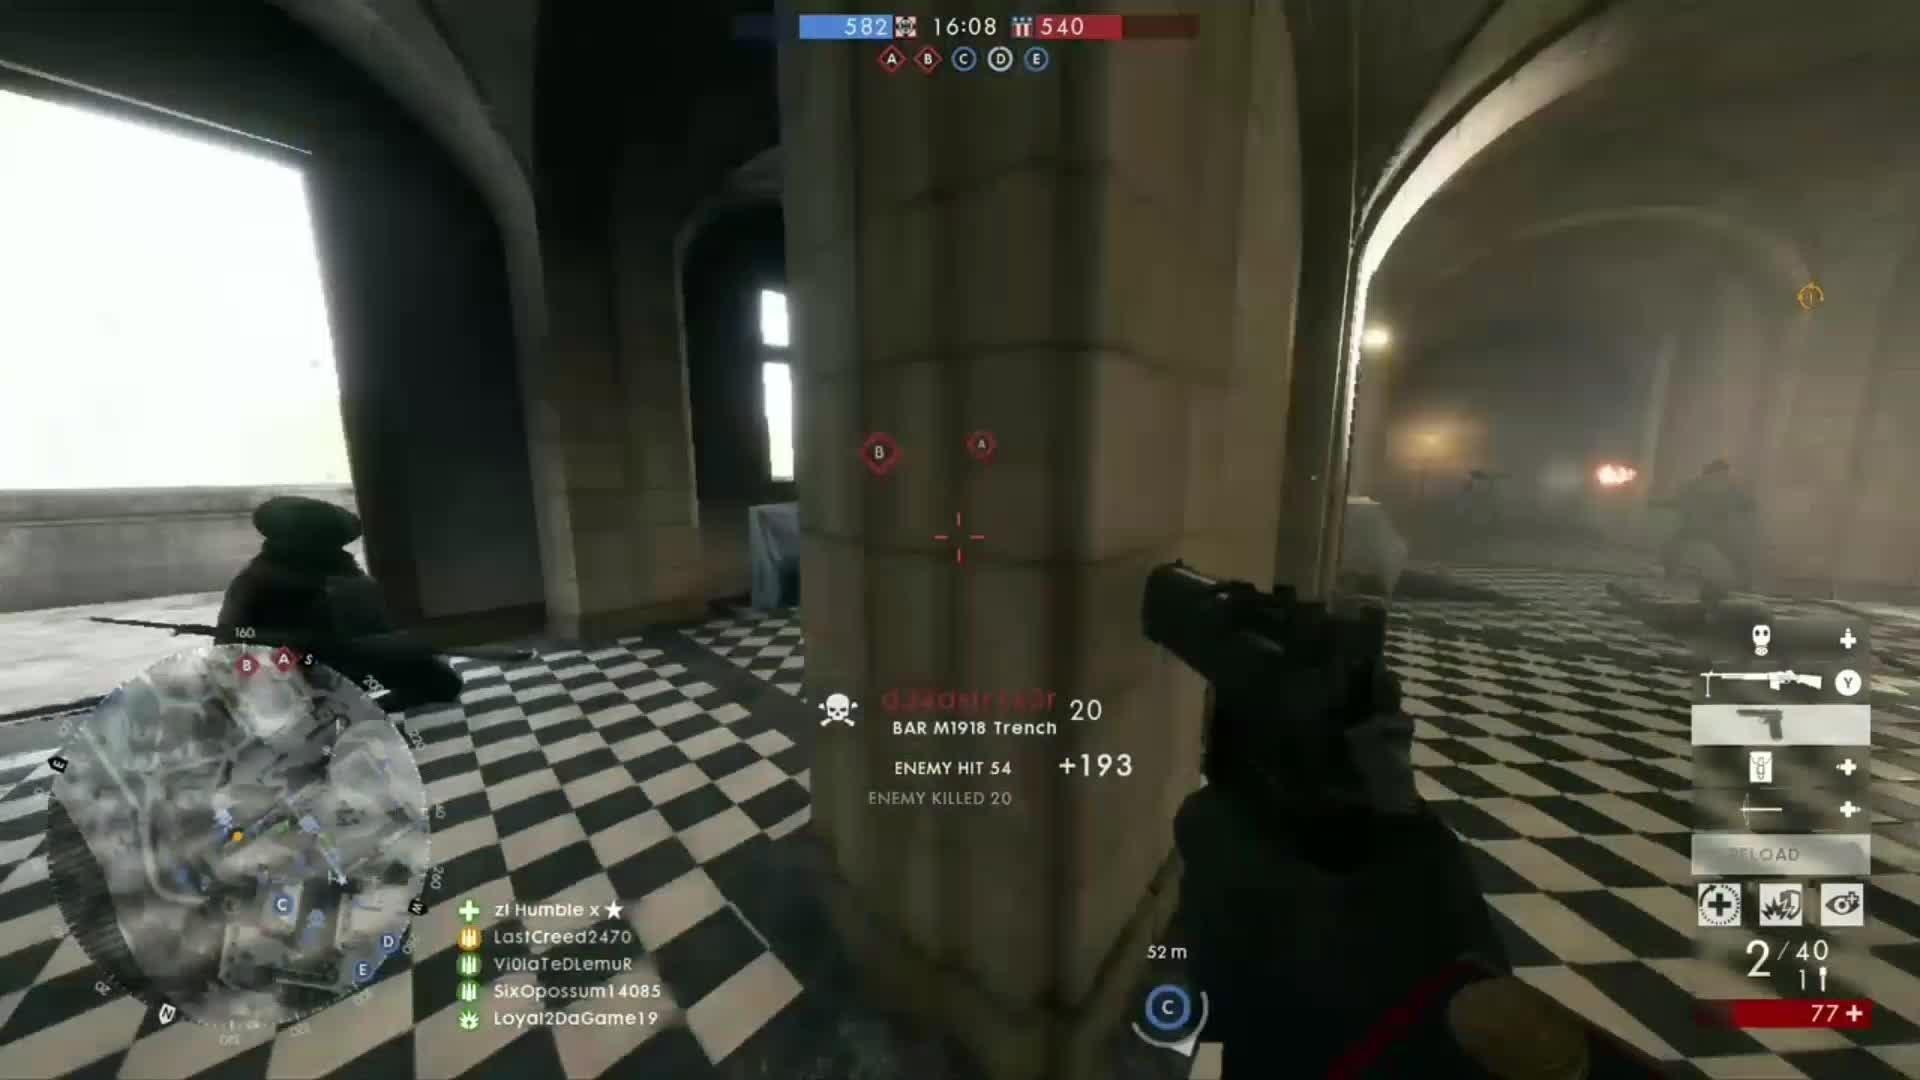 Battlefield: General - Battlefield 1 is the best battlefield game👍👍 video cover image 0